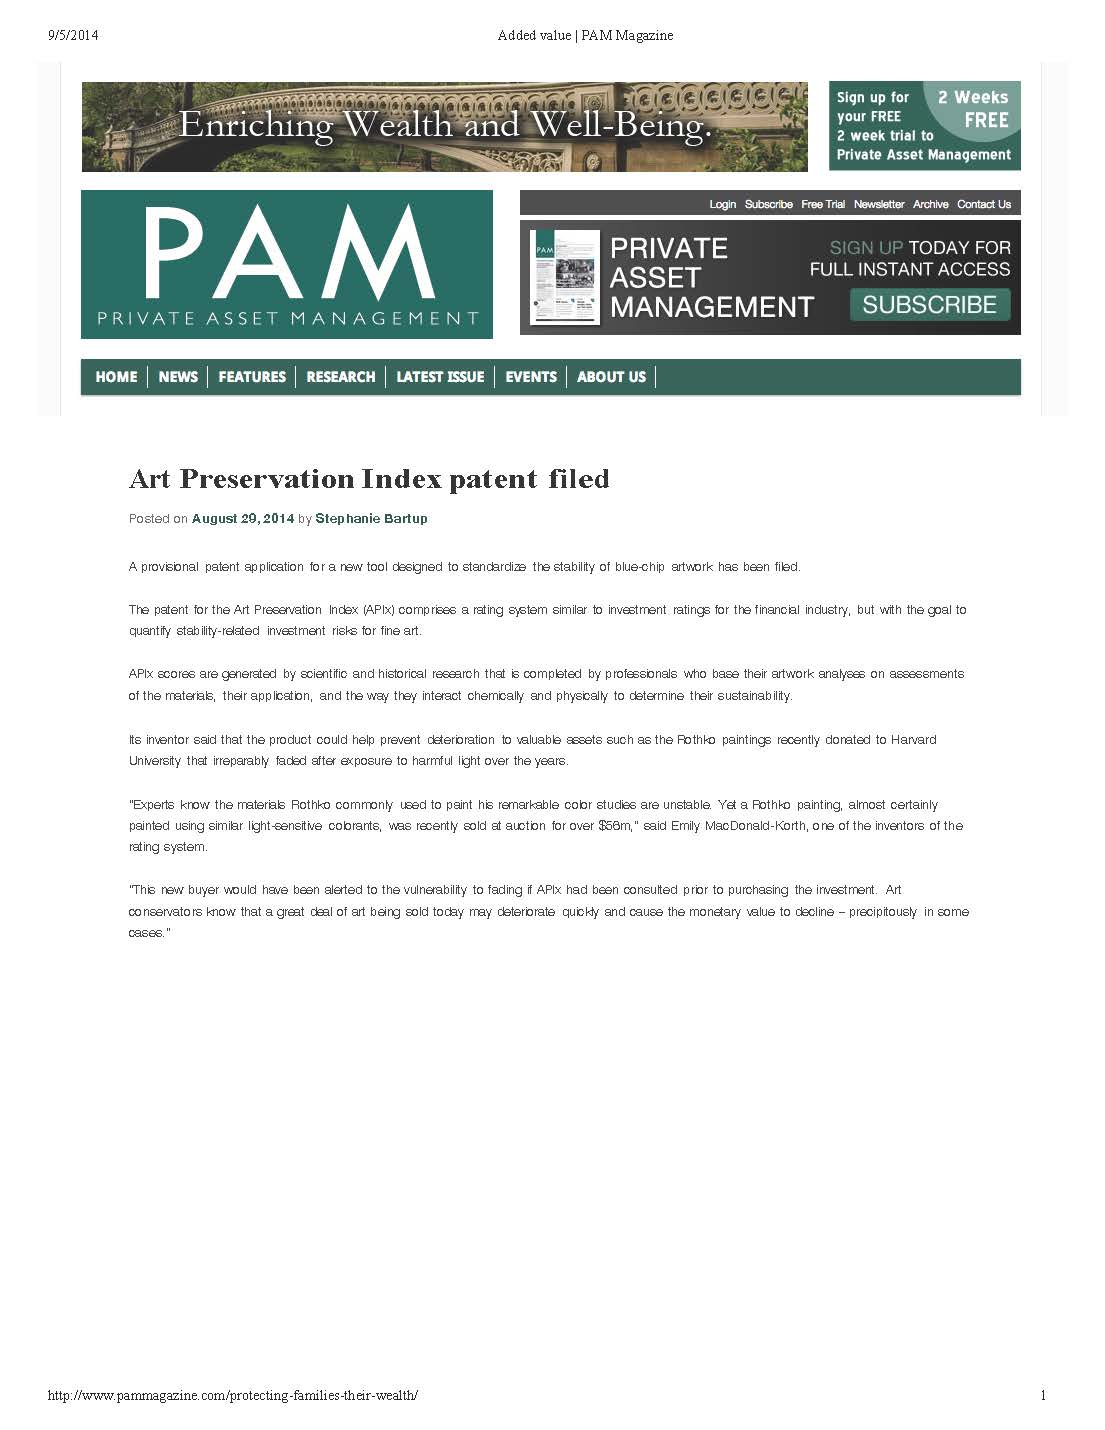 Private Asset Management Magazine